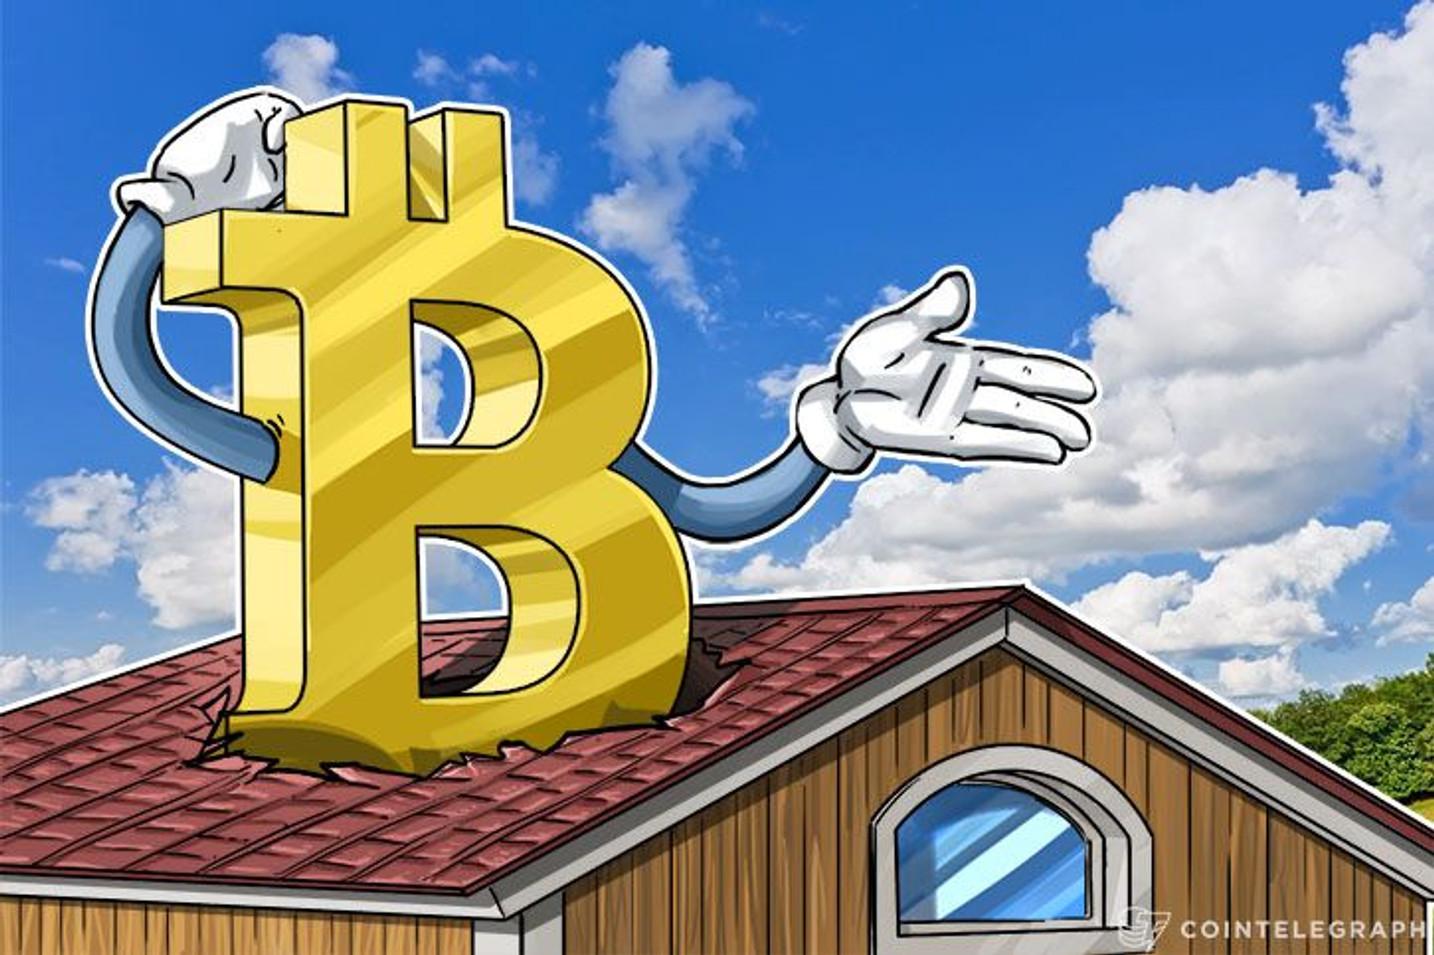 Bitcoin Crash? Futures Price For Bitcoin Cash Plunges 50%, BTC Up 7%